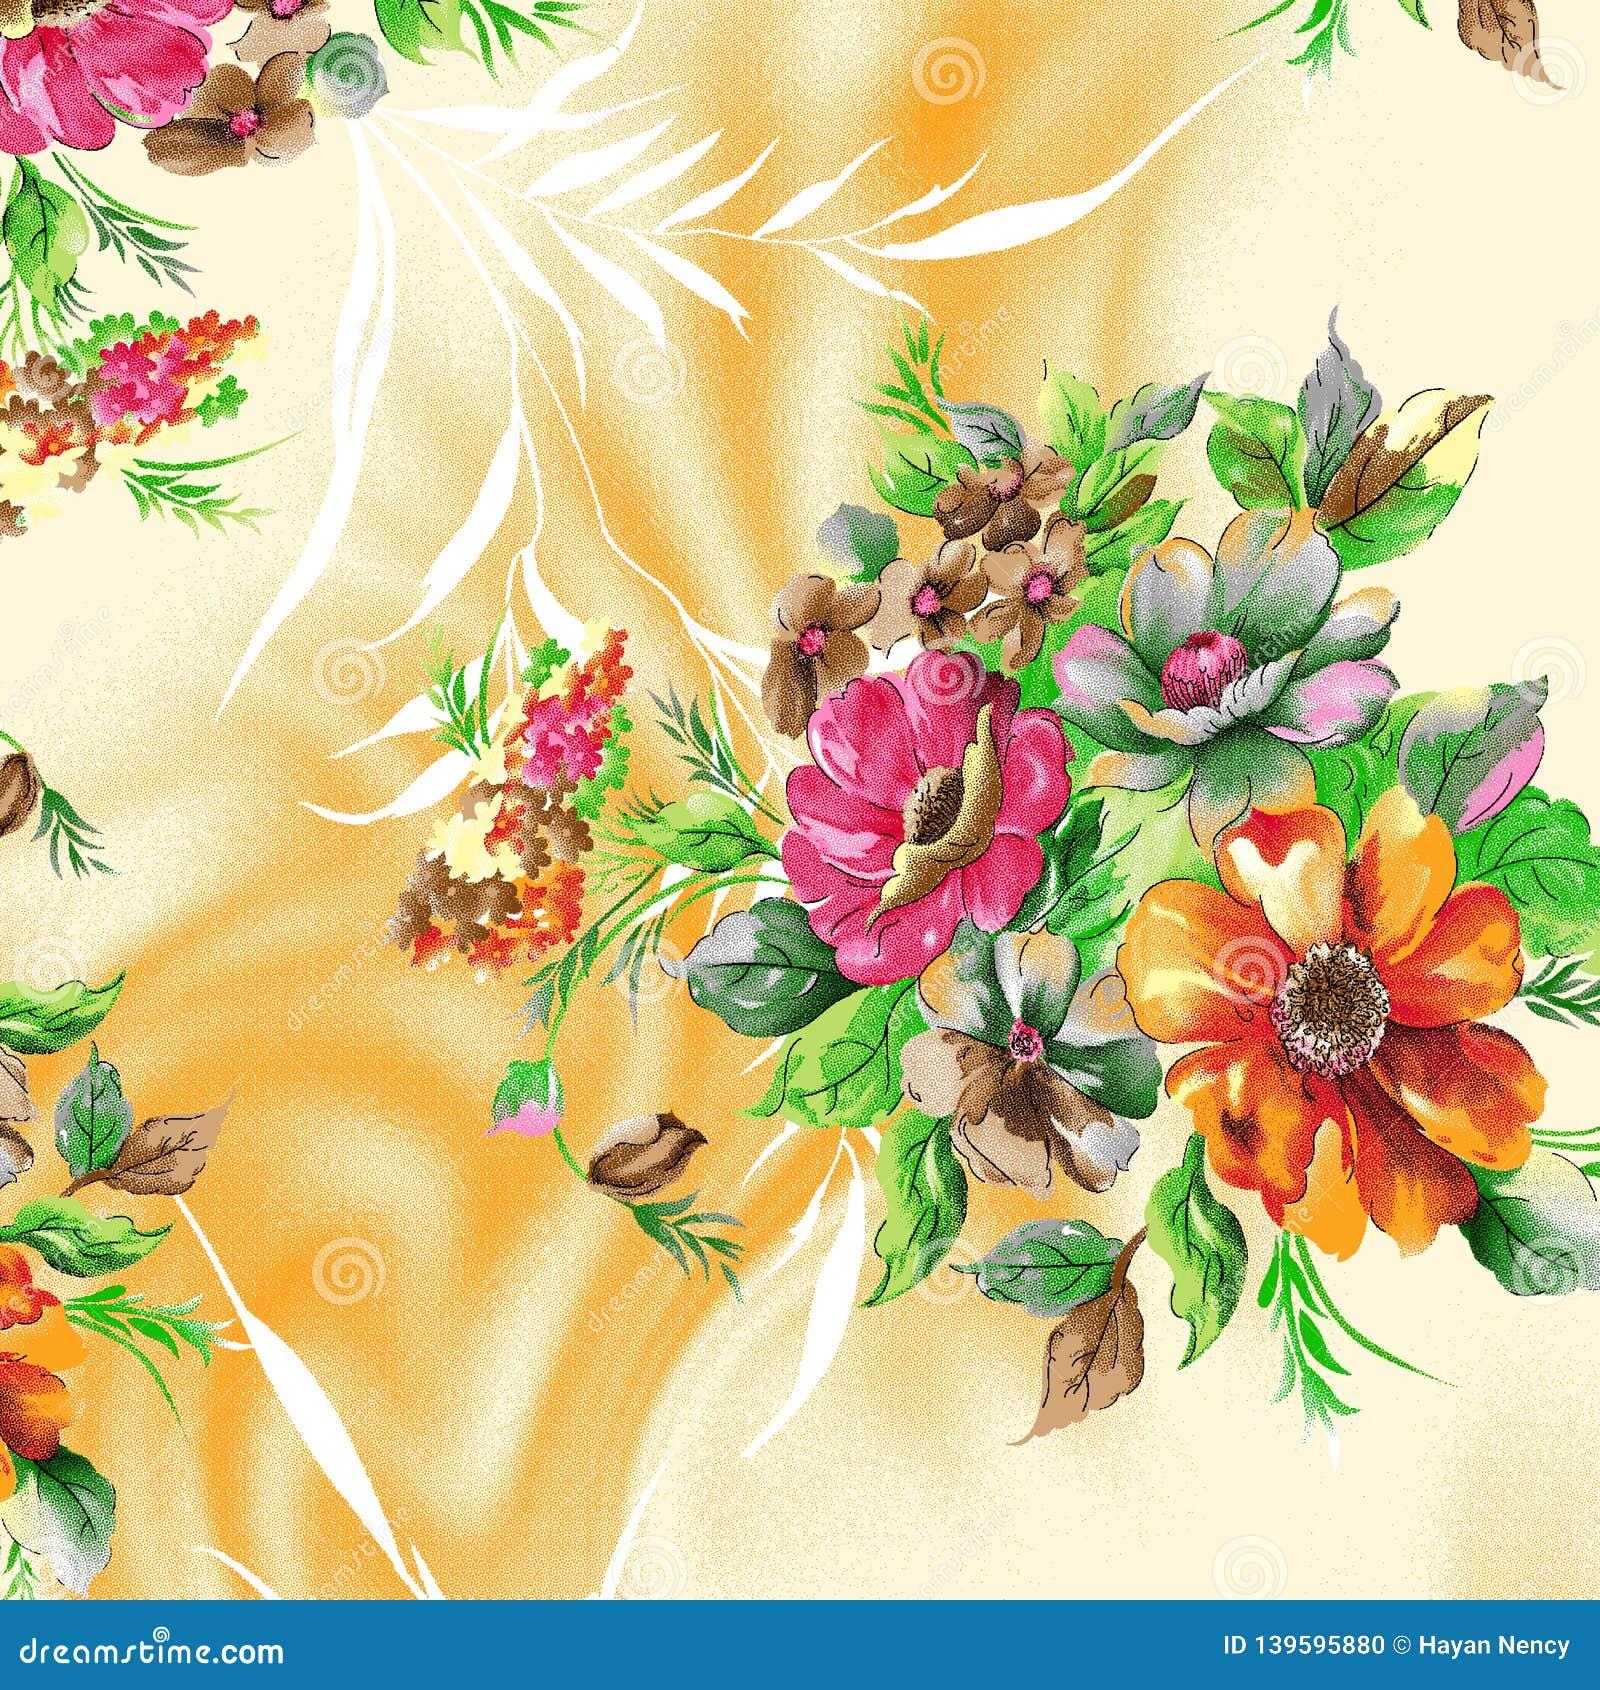 Beautiful raster pattern with nice watercolor digital flowers